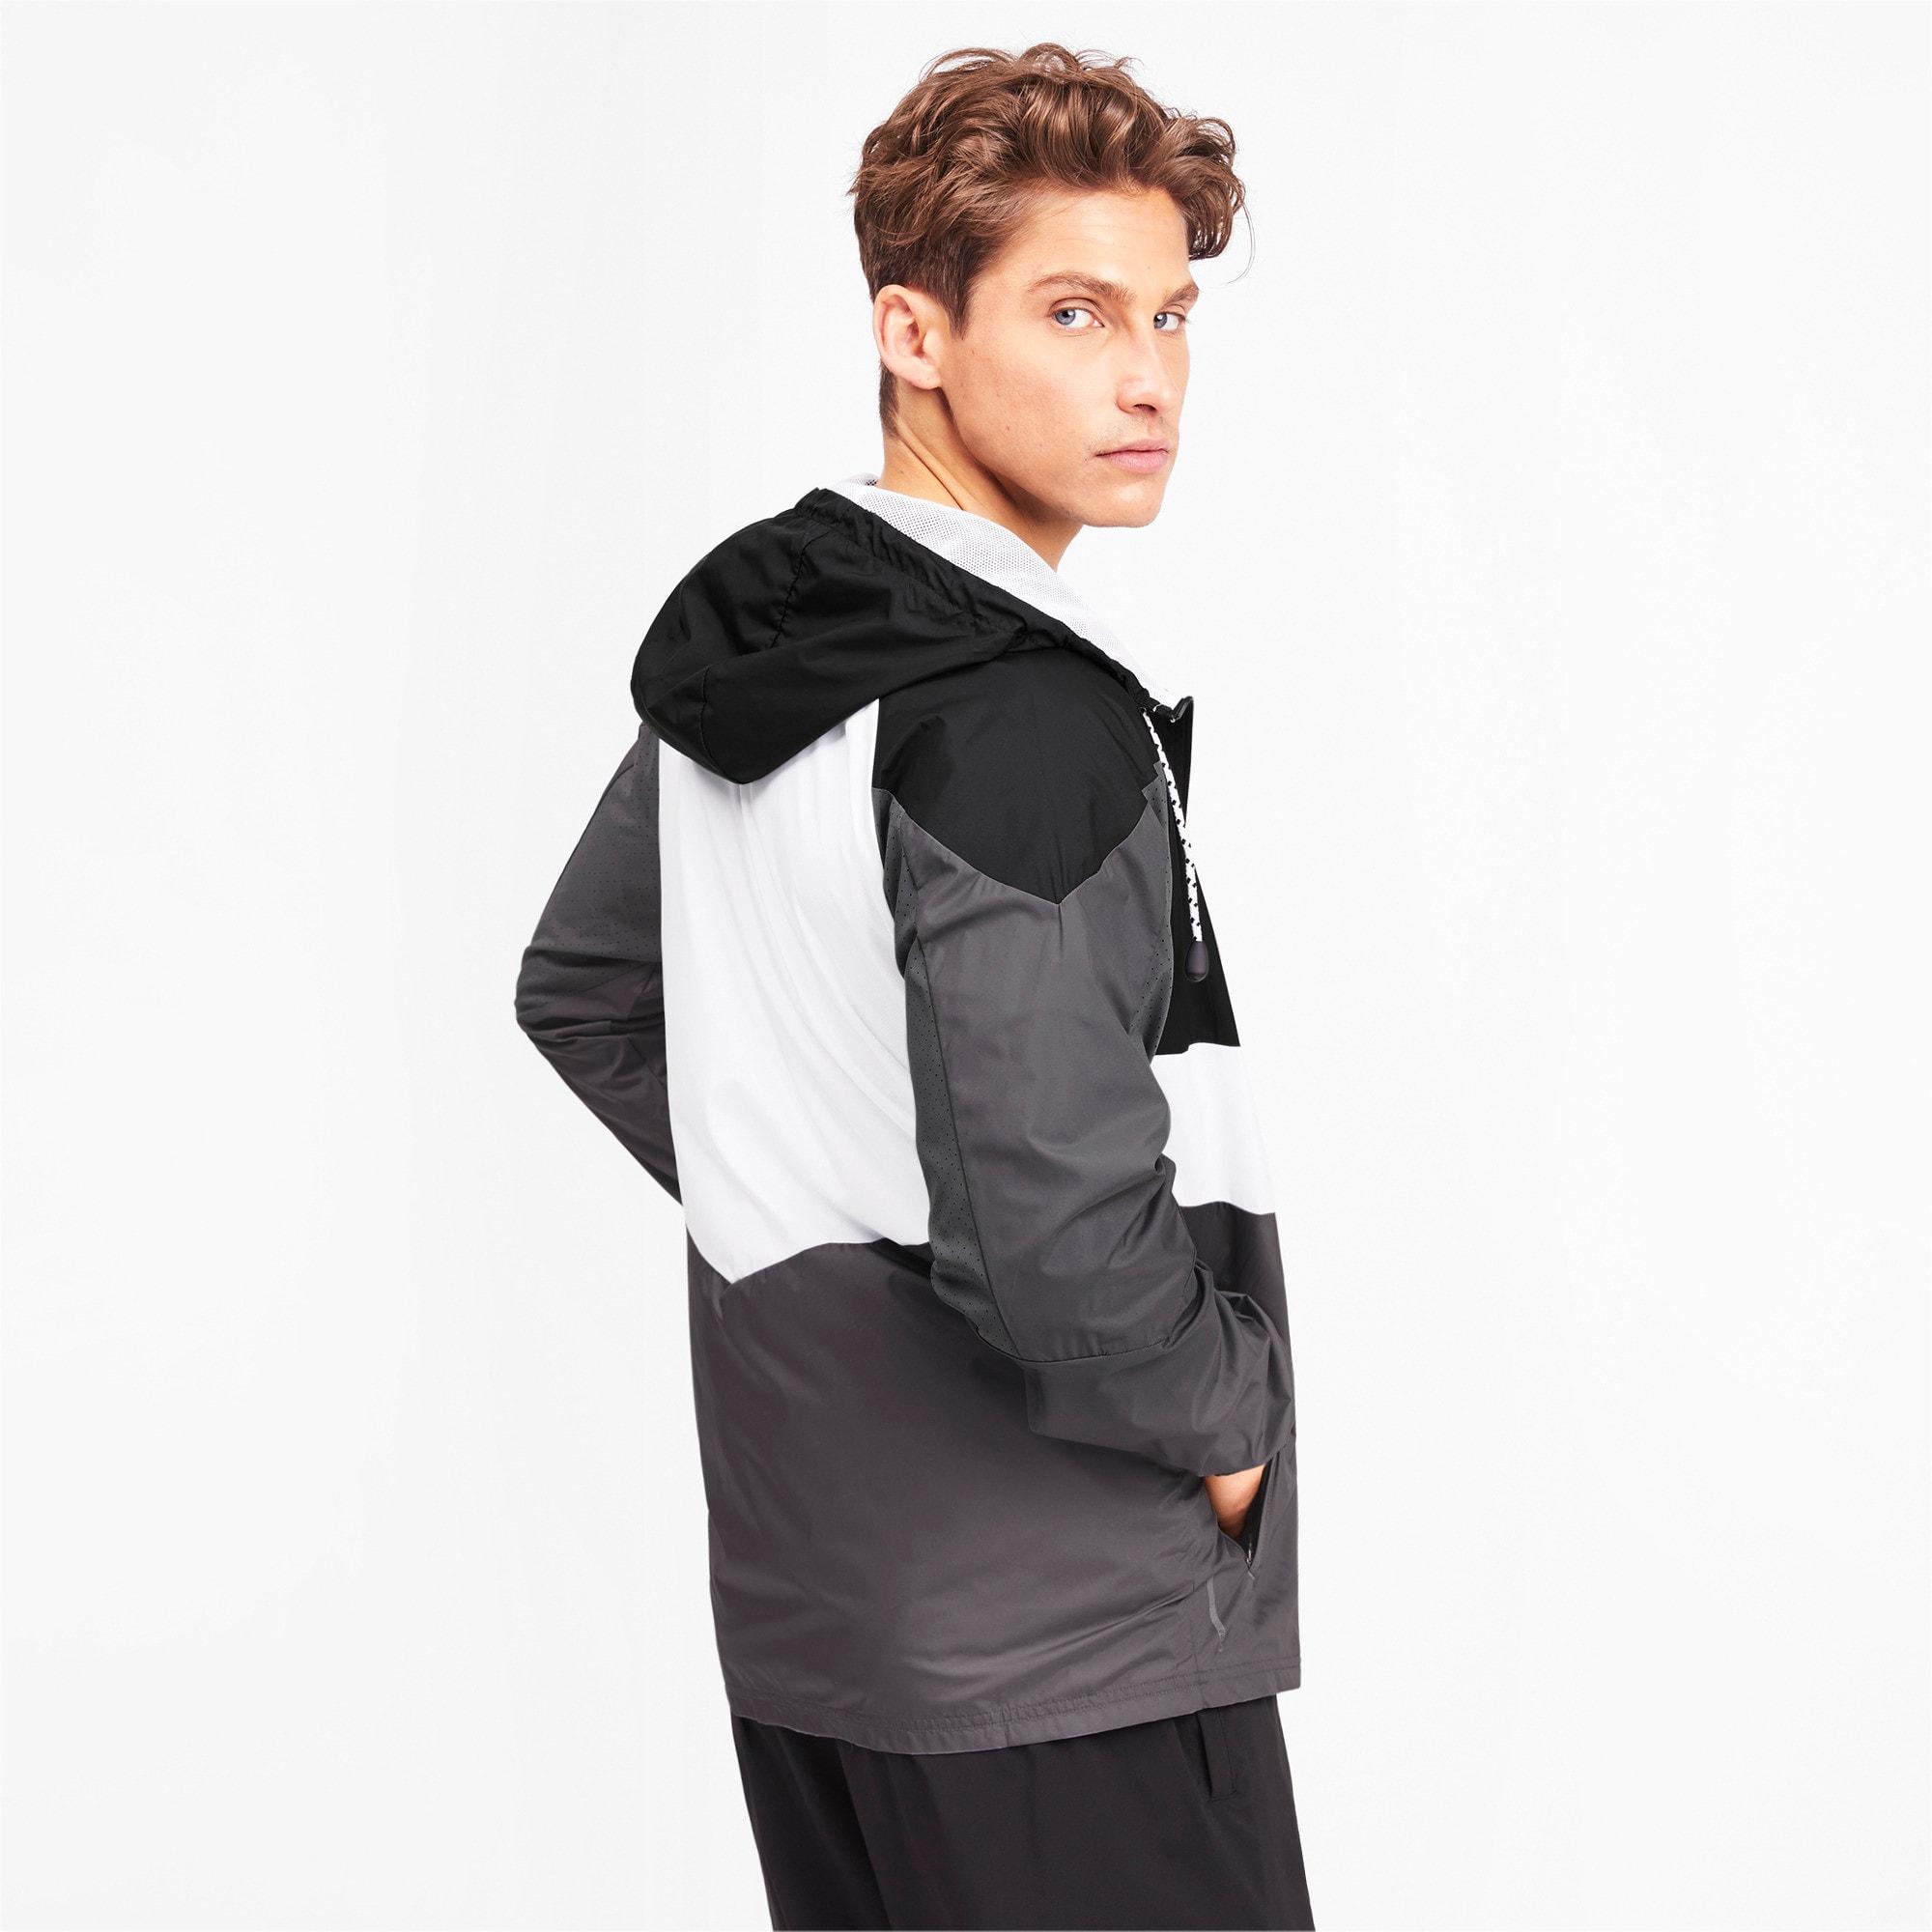 Thumbnail 2 of Reactive Woven Men's Training Jacket, Black-CASTLEROCK-White, medium